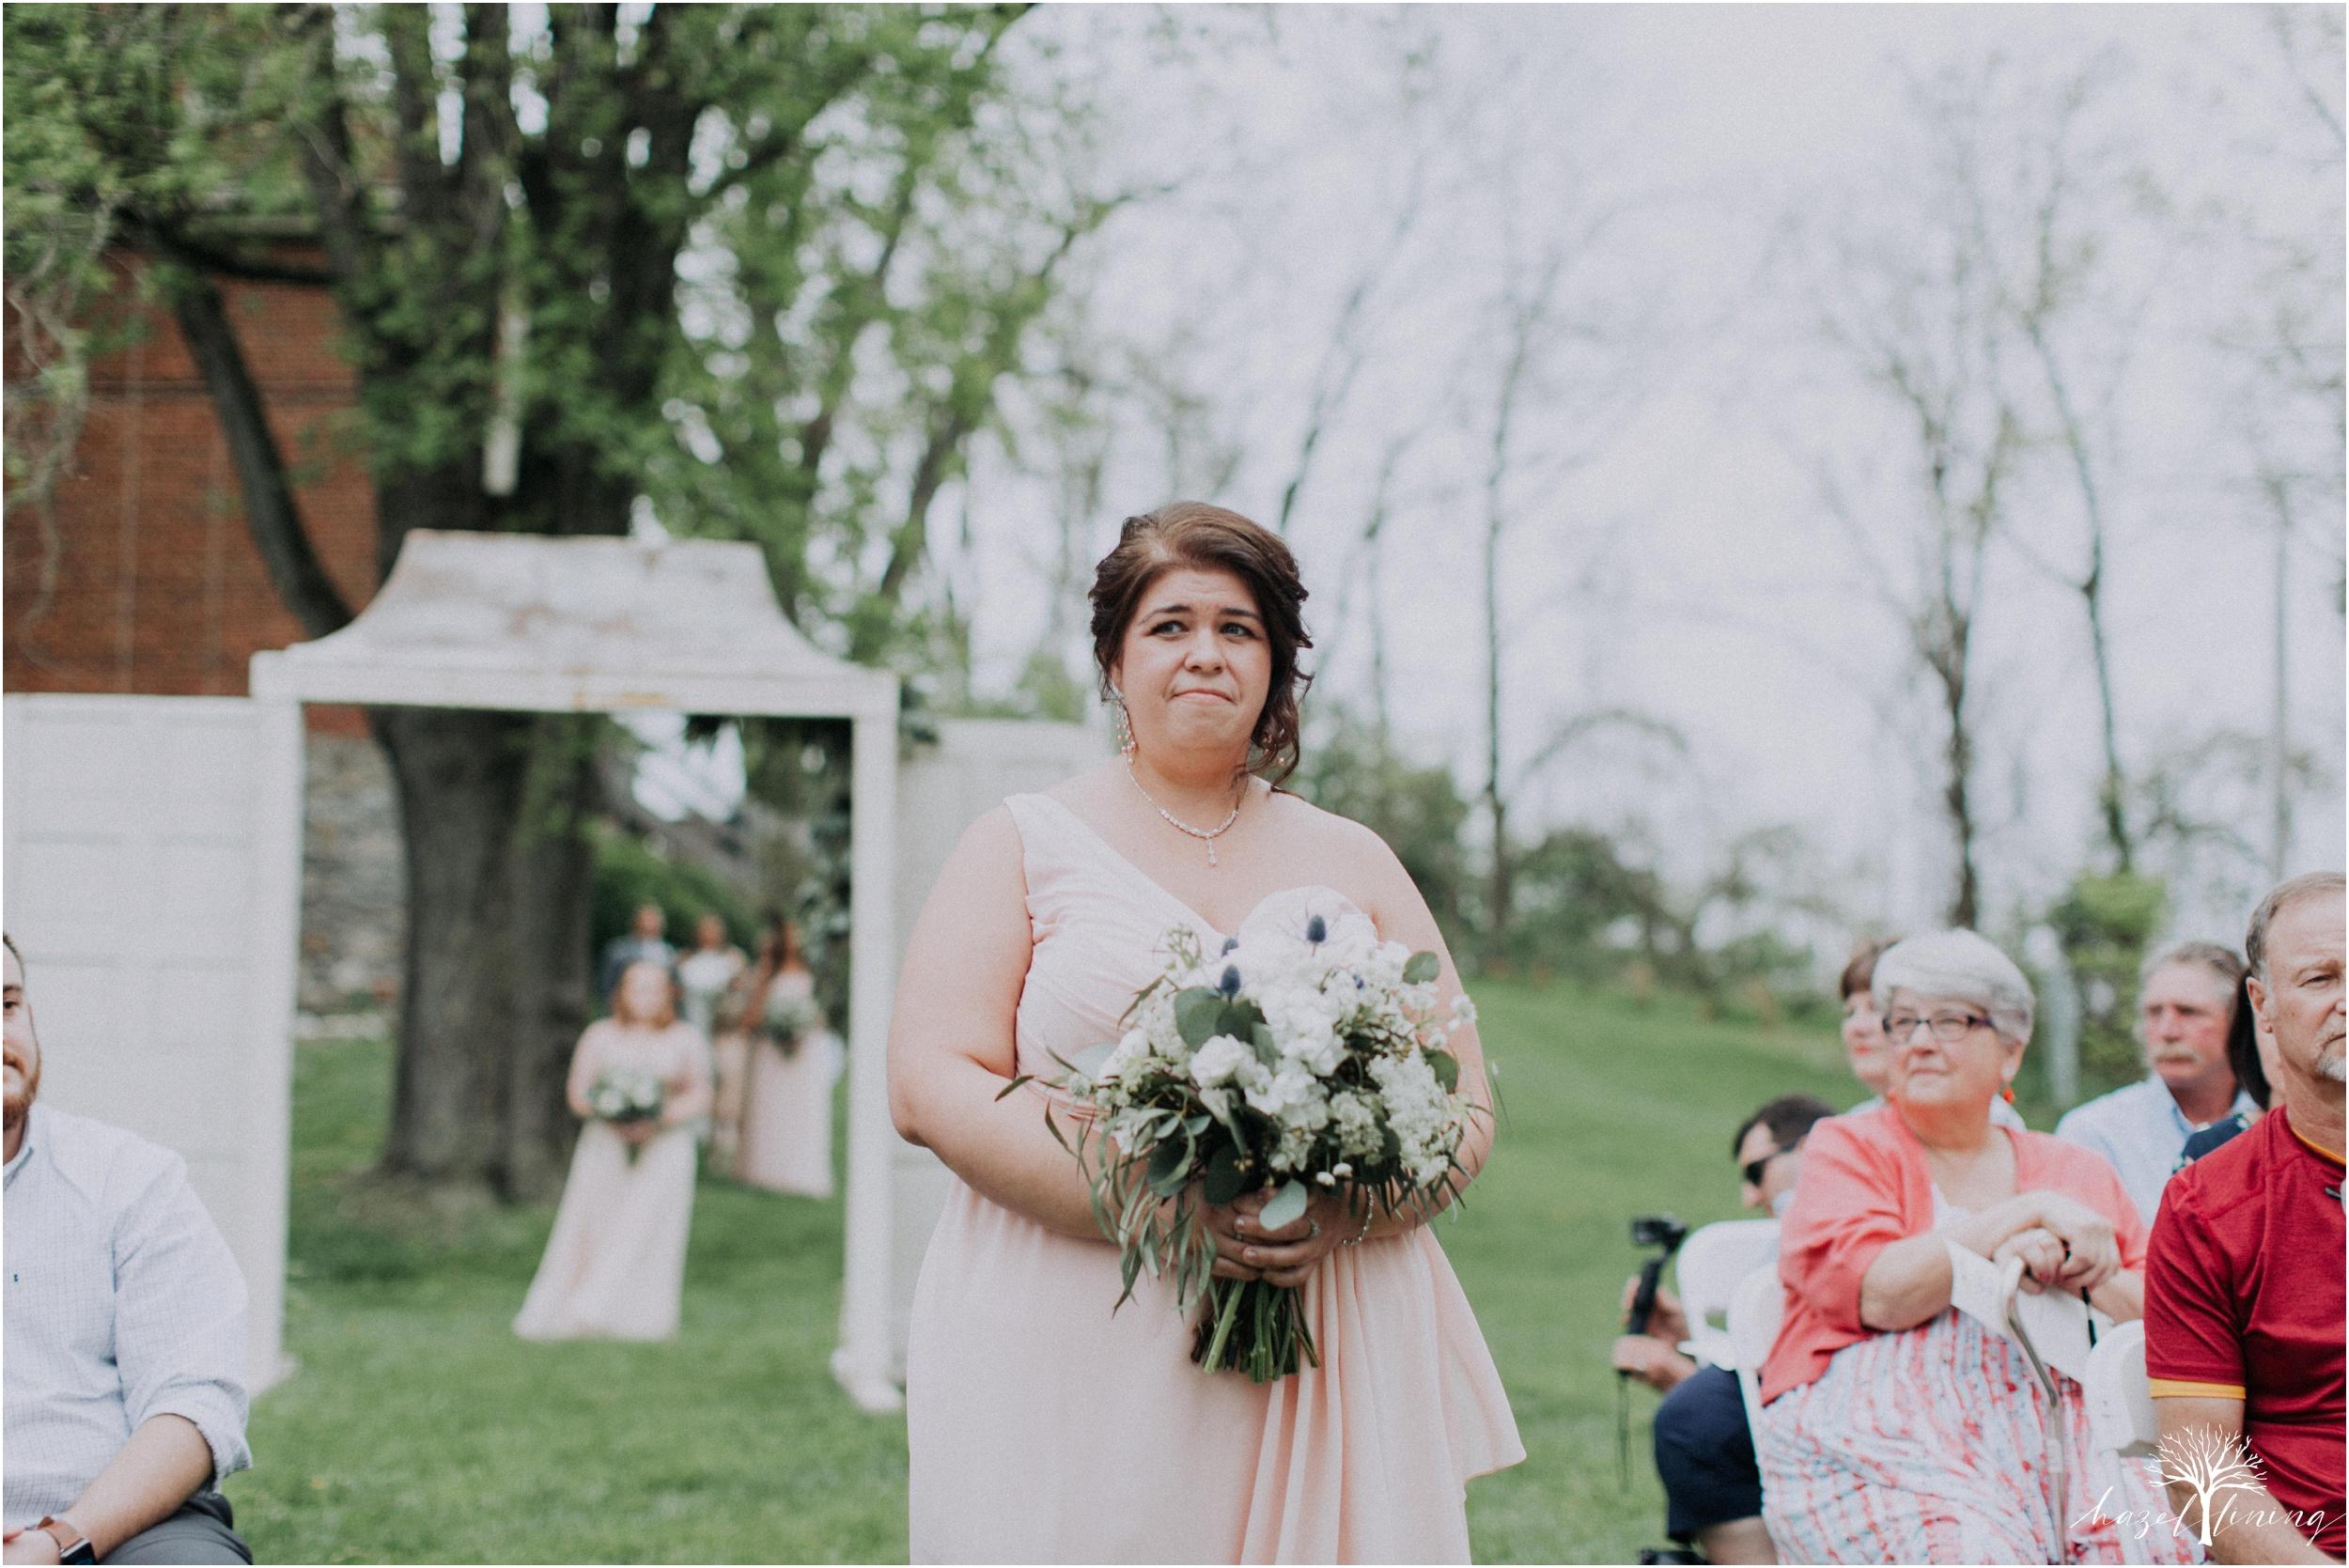 hazel-lining-travel-wedding-elopement-photography-abby-skyler-hunt-the-willis-house-york-pennsylvania-outdoor-estate-wedding_0072.jpg